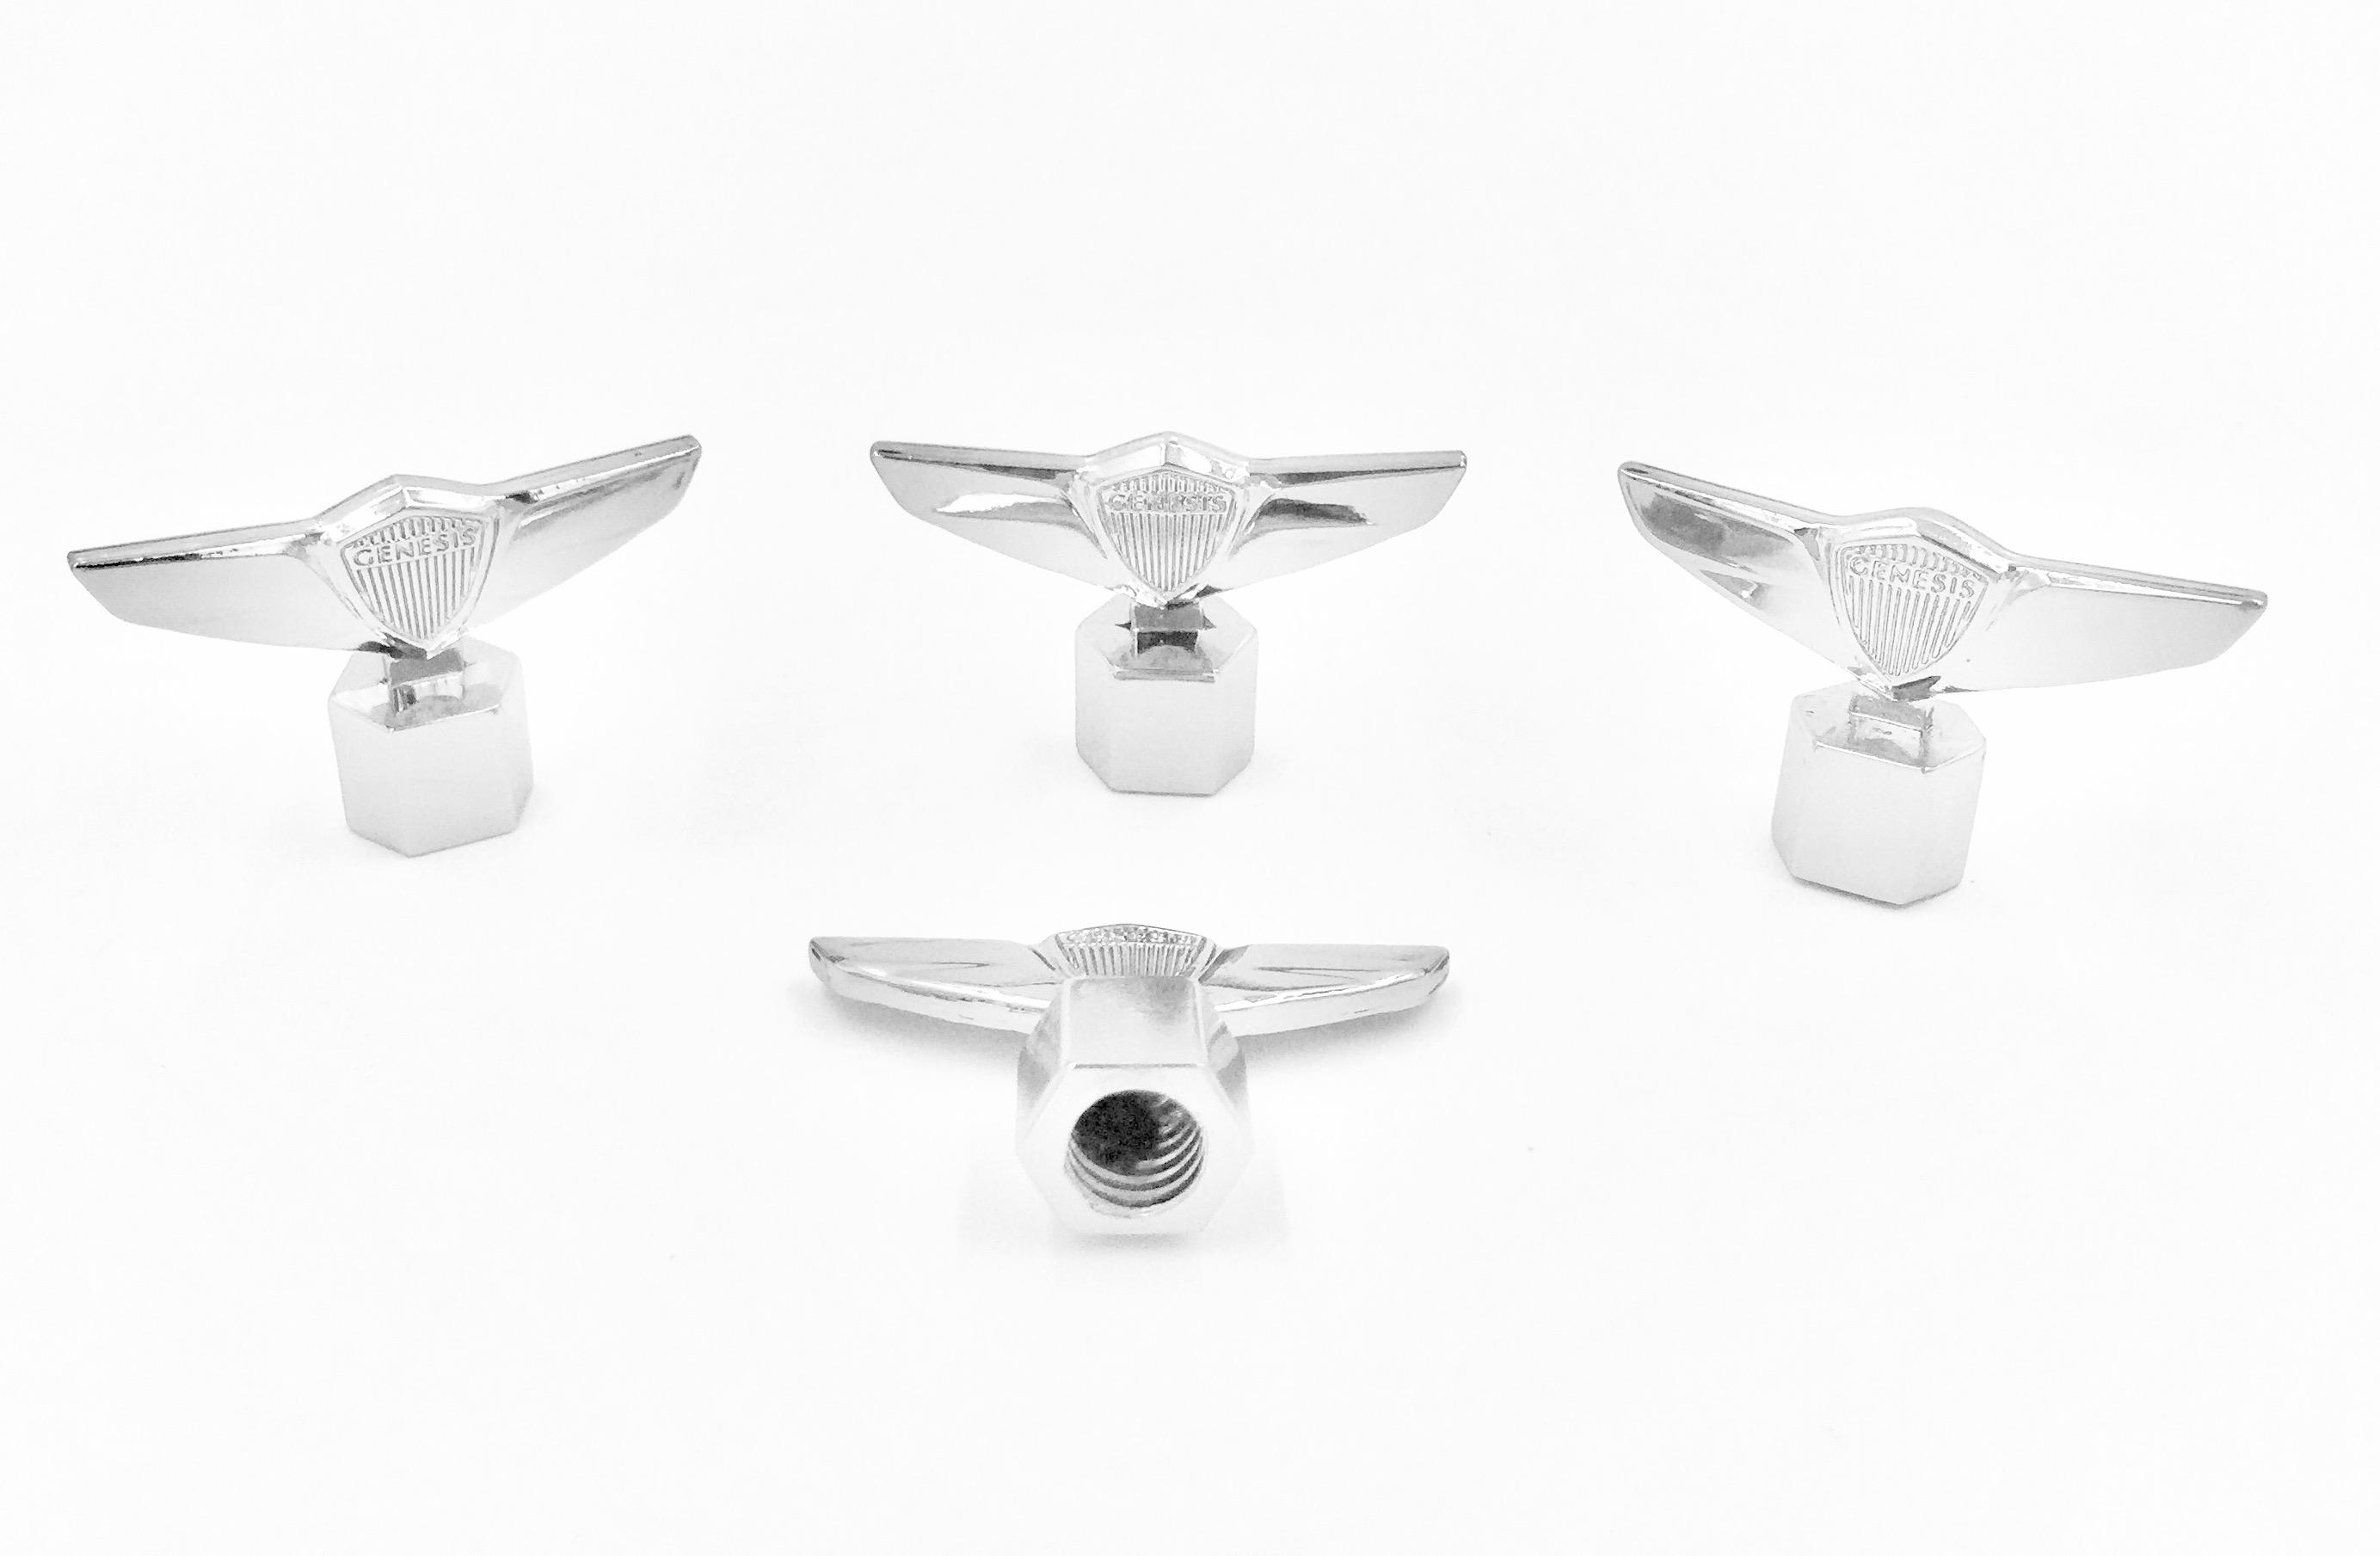 Genesis Wing 3D Valve Caps